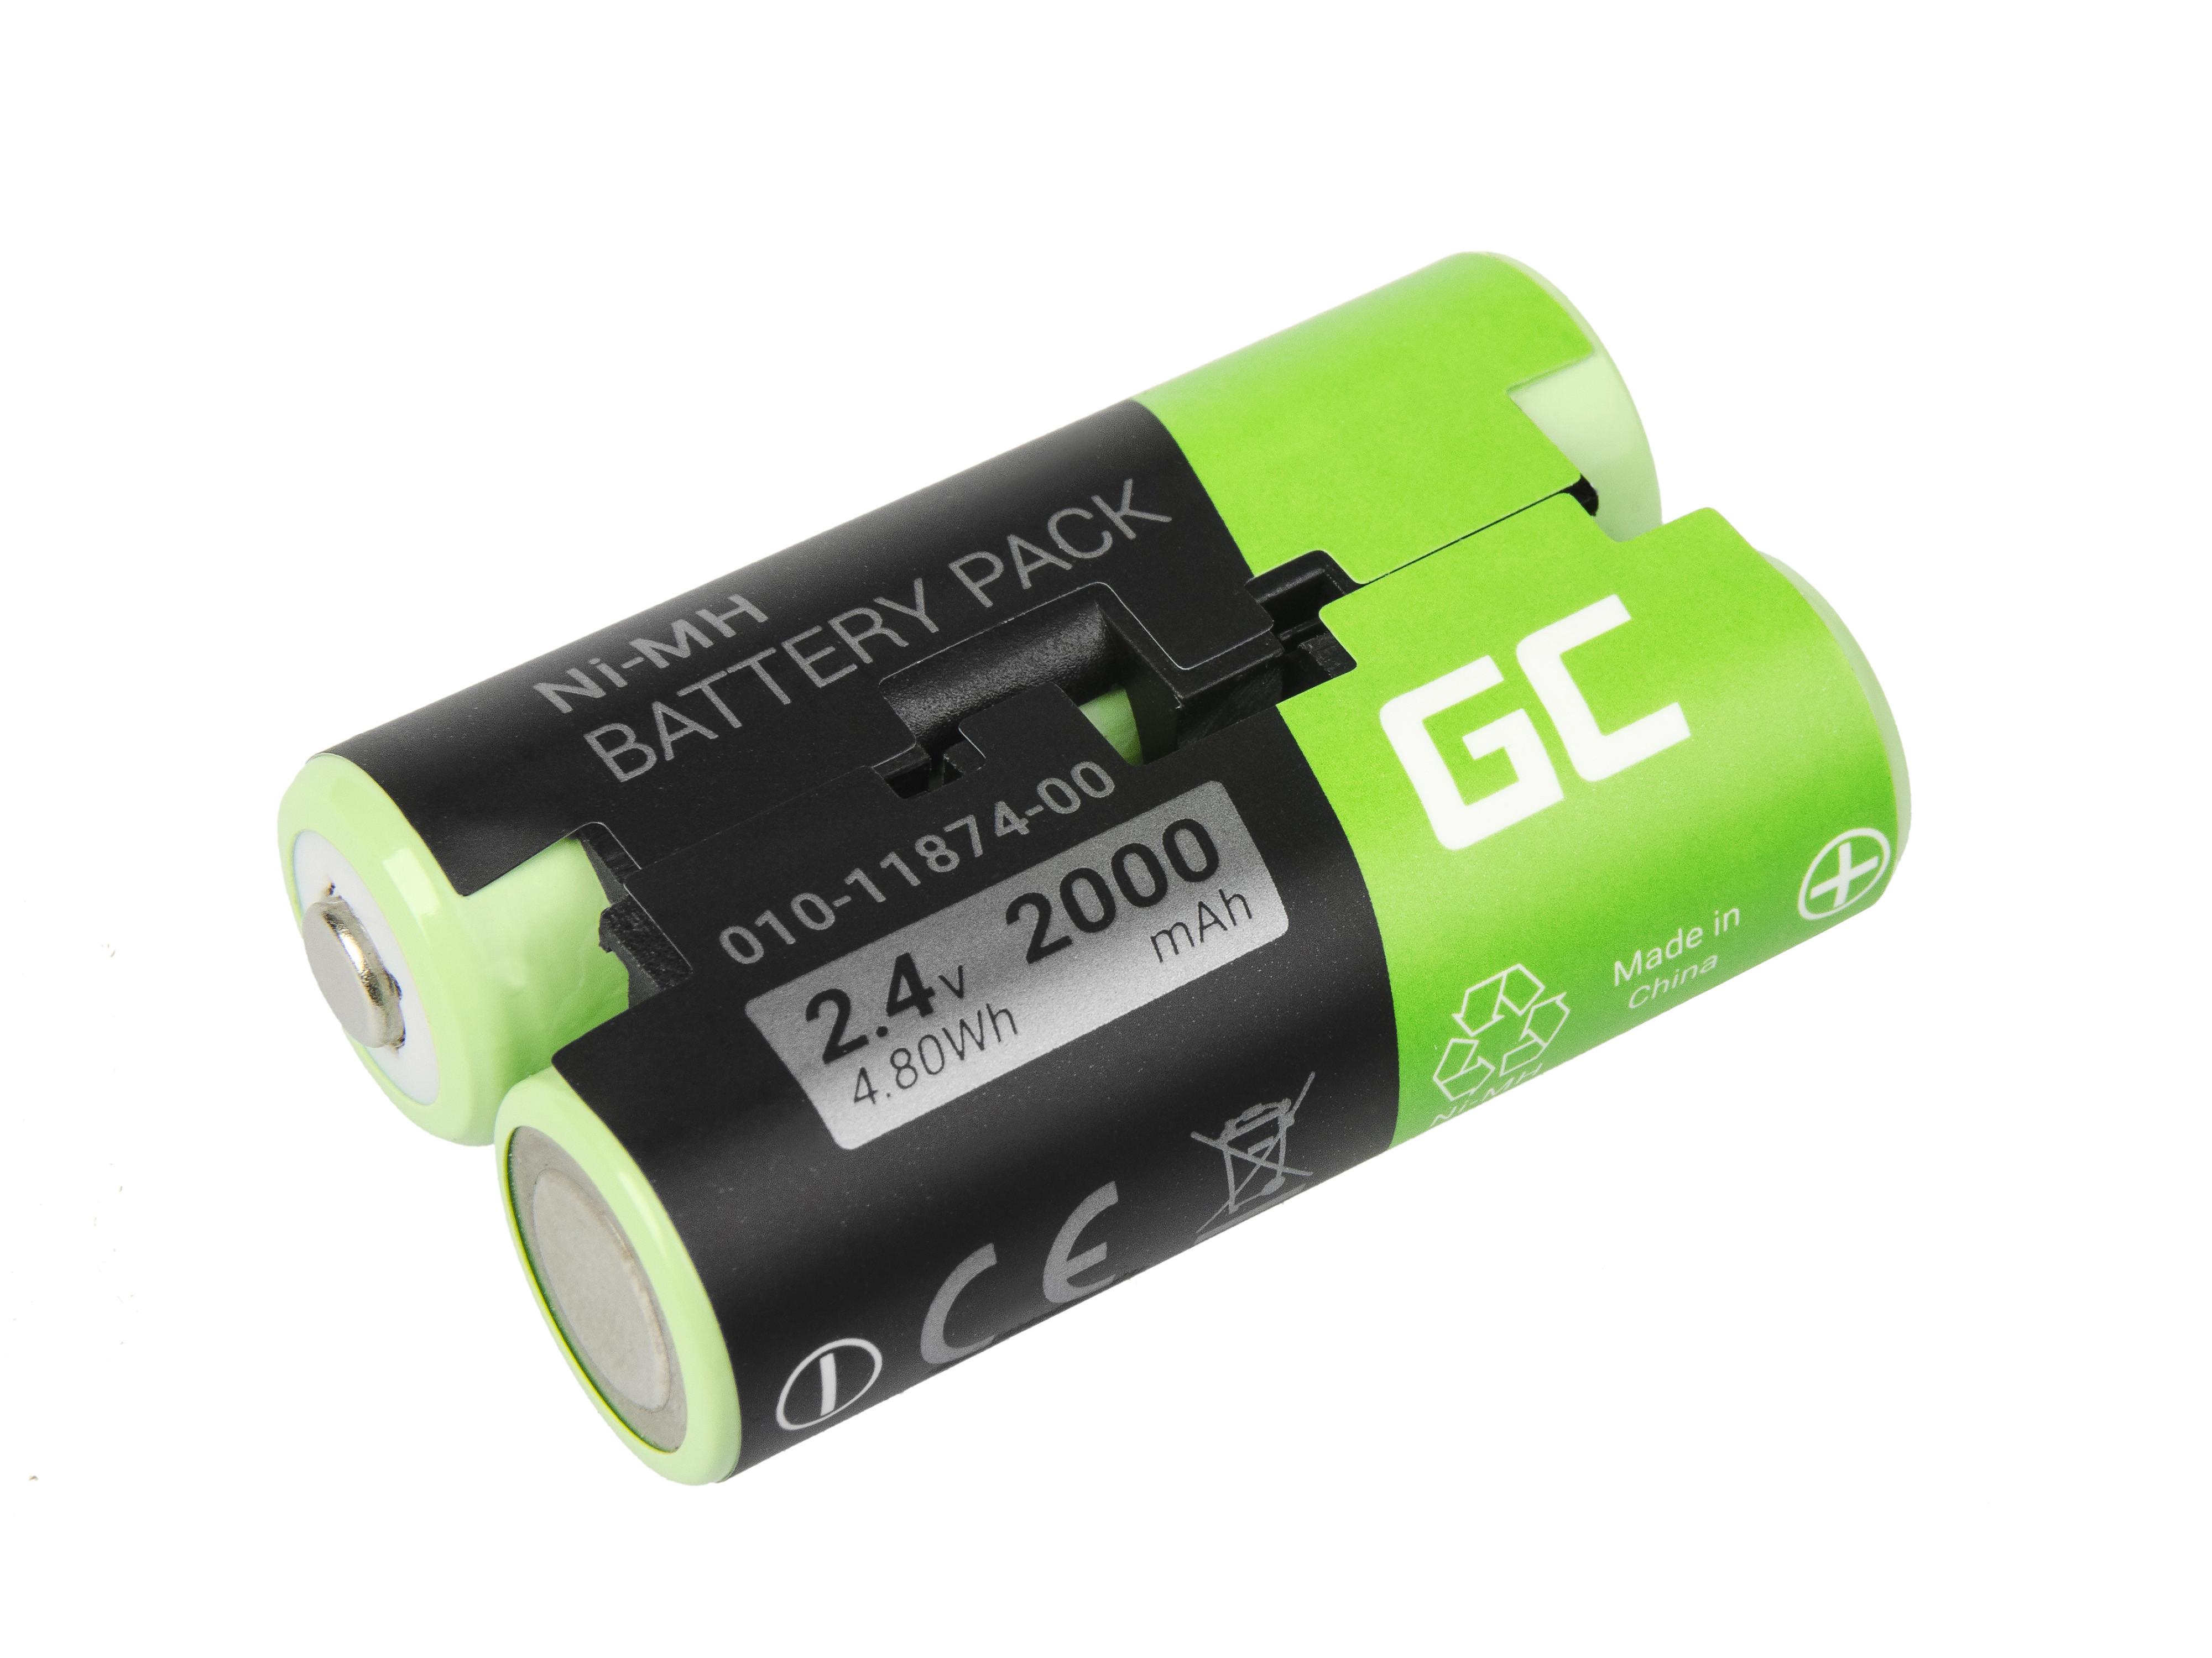 Green Cell Baterie Garmin 010-11874-00 pro GPS Garmin Astro 430 900 GPSMAP 62s 66st PRO Oregon 600t 650 750t PRO, 2000mAh Ni-MH - neoriginální